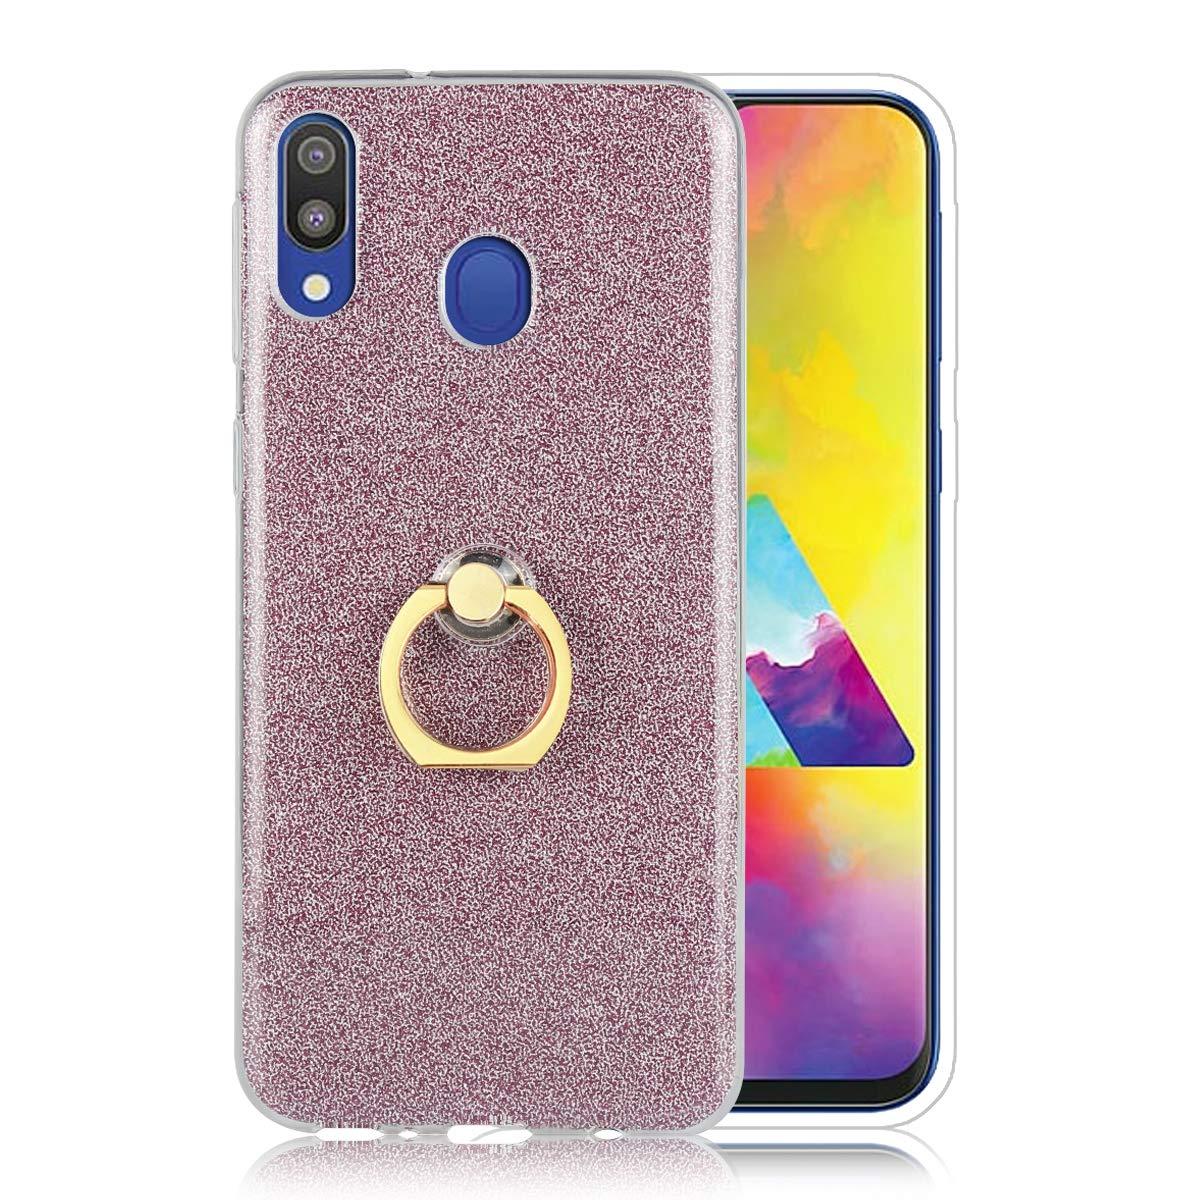 Misstars H/ülle f/ür Galaxy M20 Ultra D/ünn Transparent Weiche TPU Silikon Glitzer Lila Papier Hybrid 2 in 1 Design Bling Schutzh/ülle mit Ring St/änder f/ür Samsung Galaxy M20